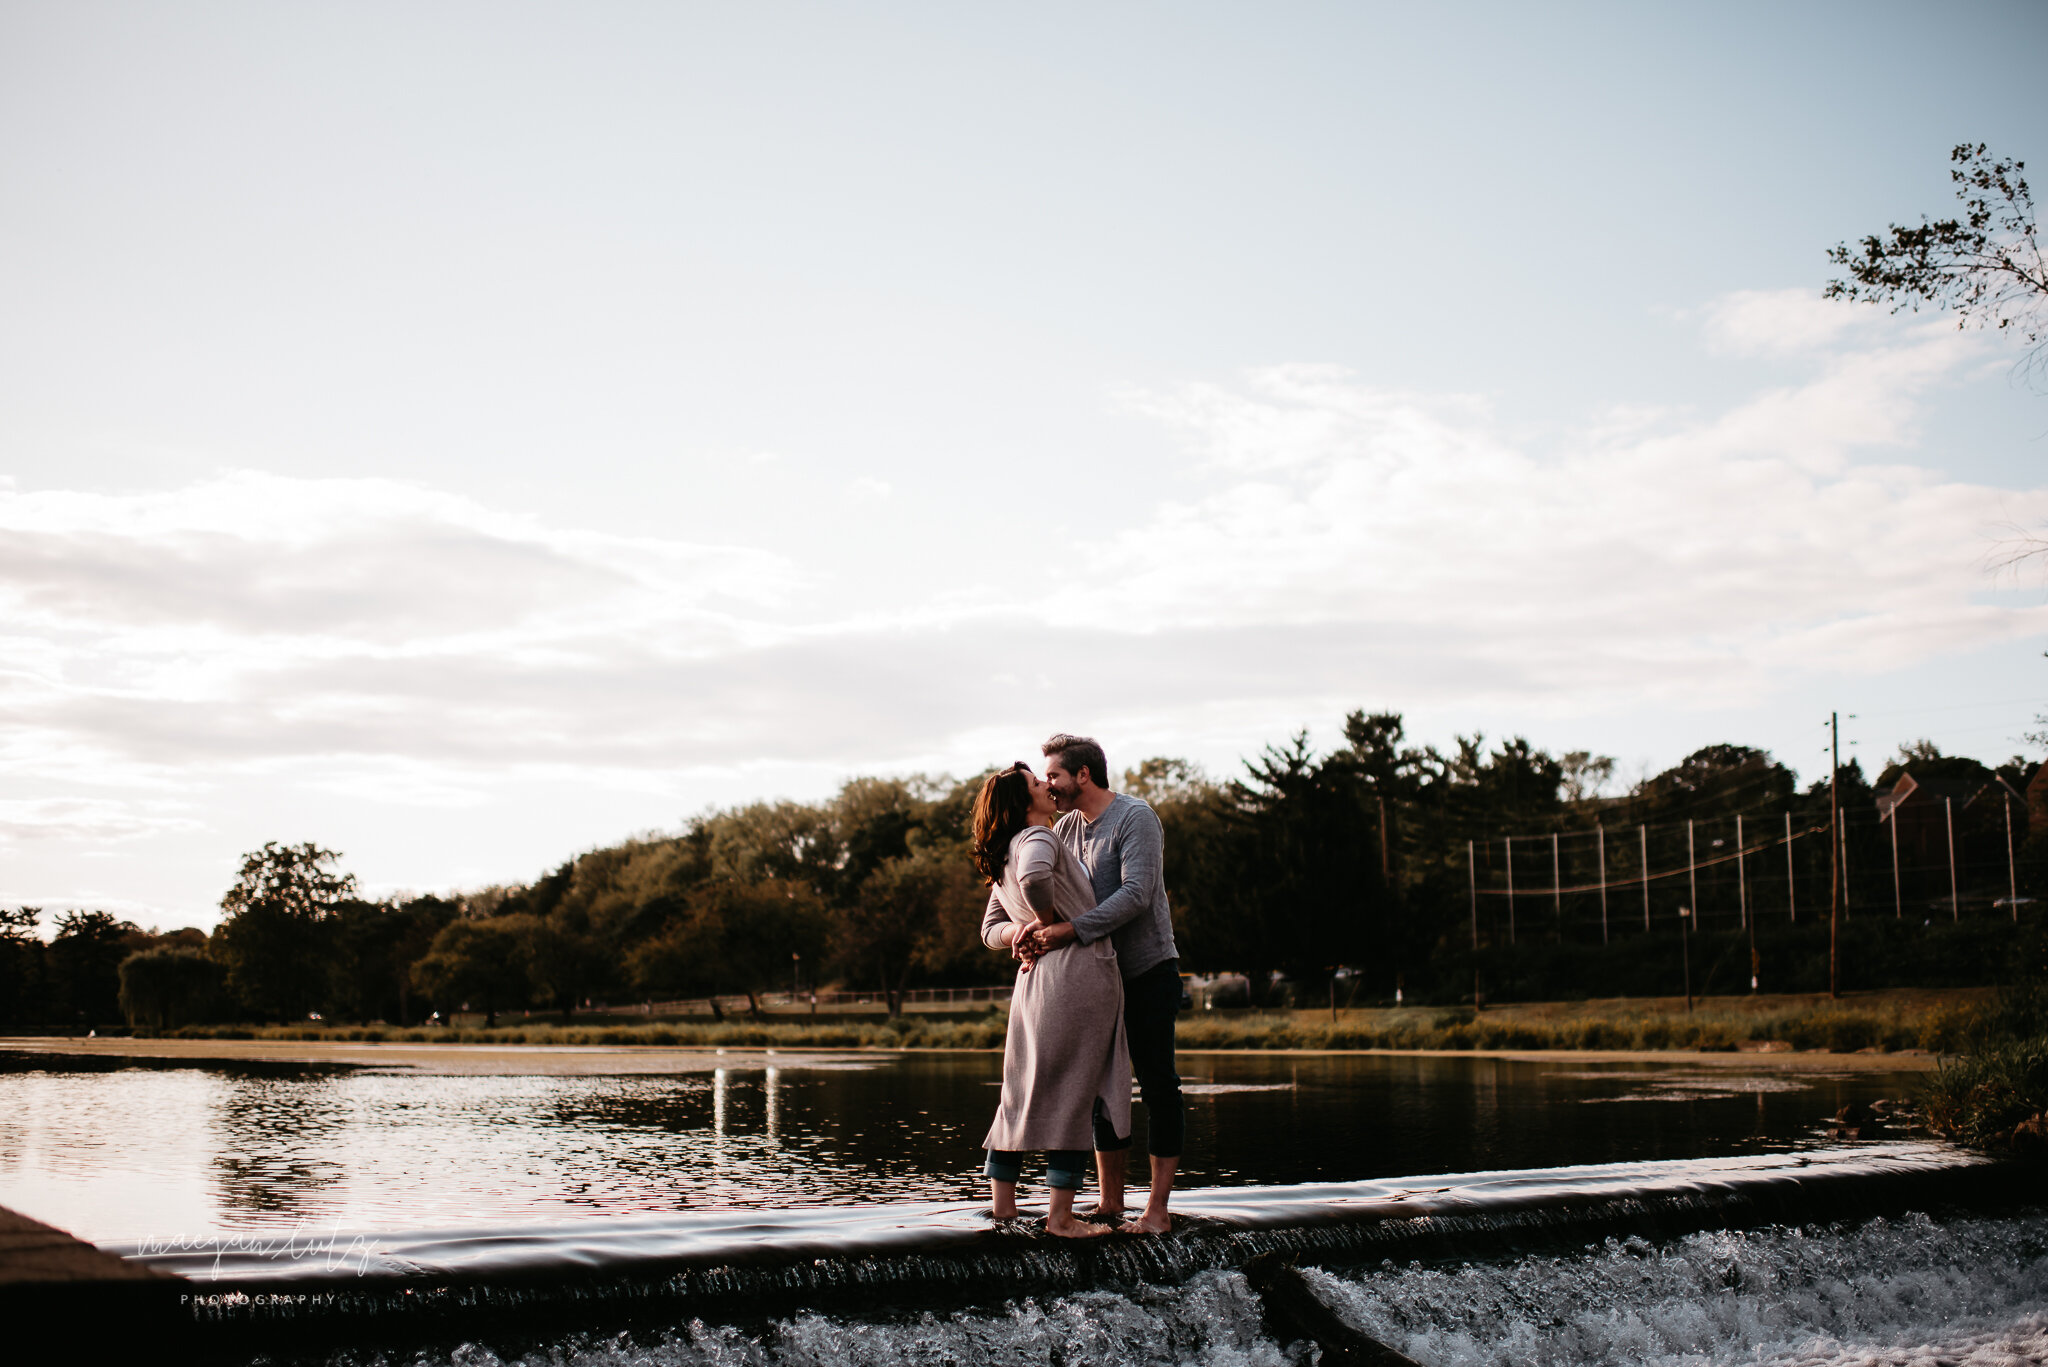 NEPA-Lehigh-Valley-Wedding-Engagement-photographer-at-the-rose-garden-allentown-PA-8.jpg